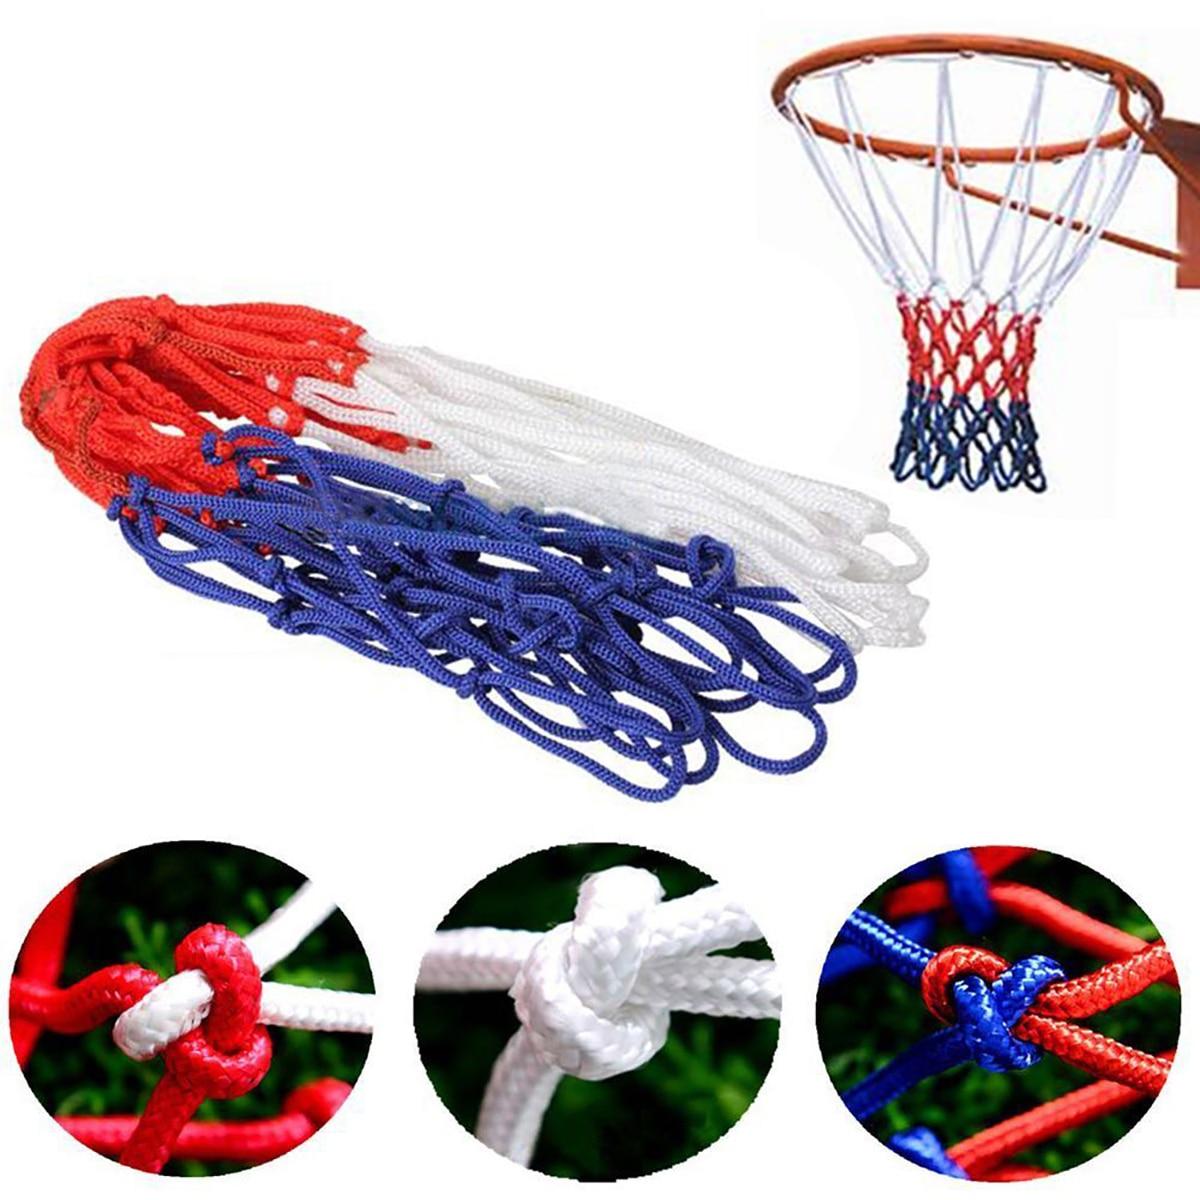 MAYITR Standard Nylon Basketball Net Thread Goal Hoop Mesh Outdoor Hanging Rim Backboard Basketball Match Training